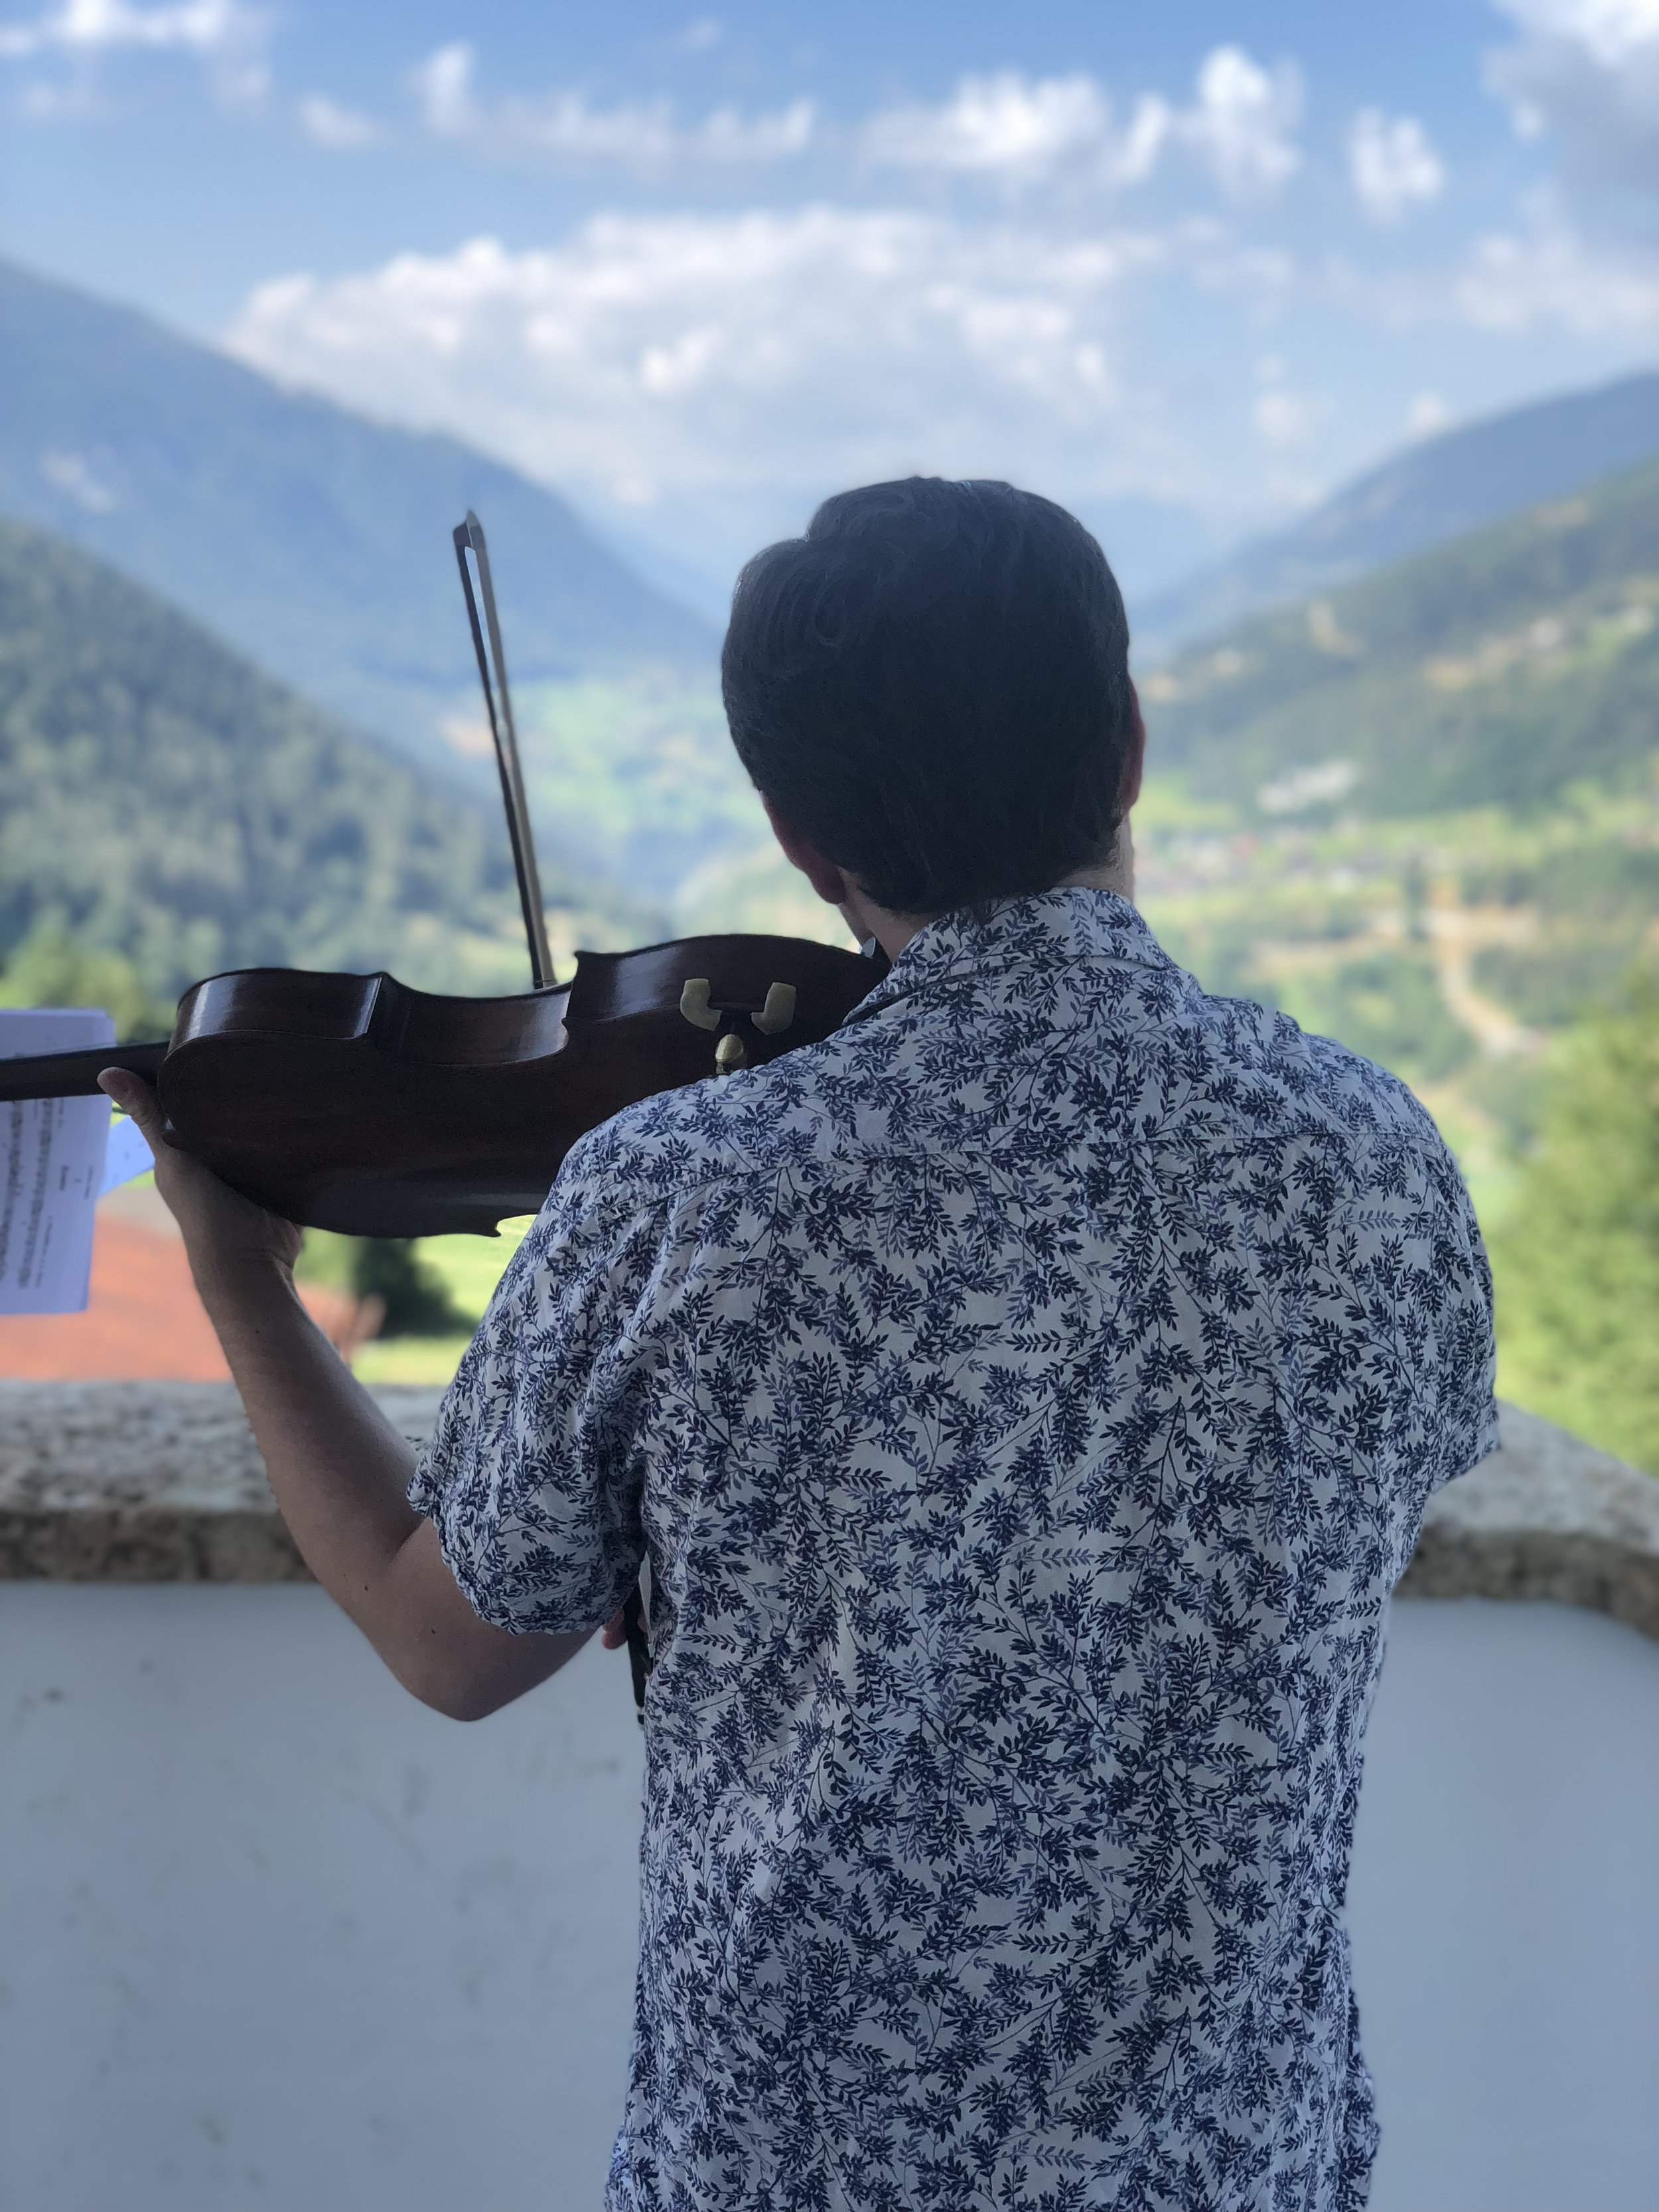 Timothy Ridout, violist